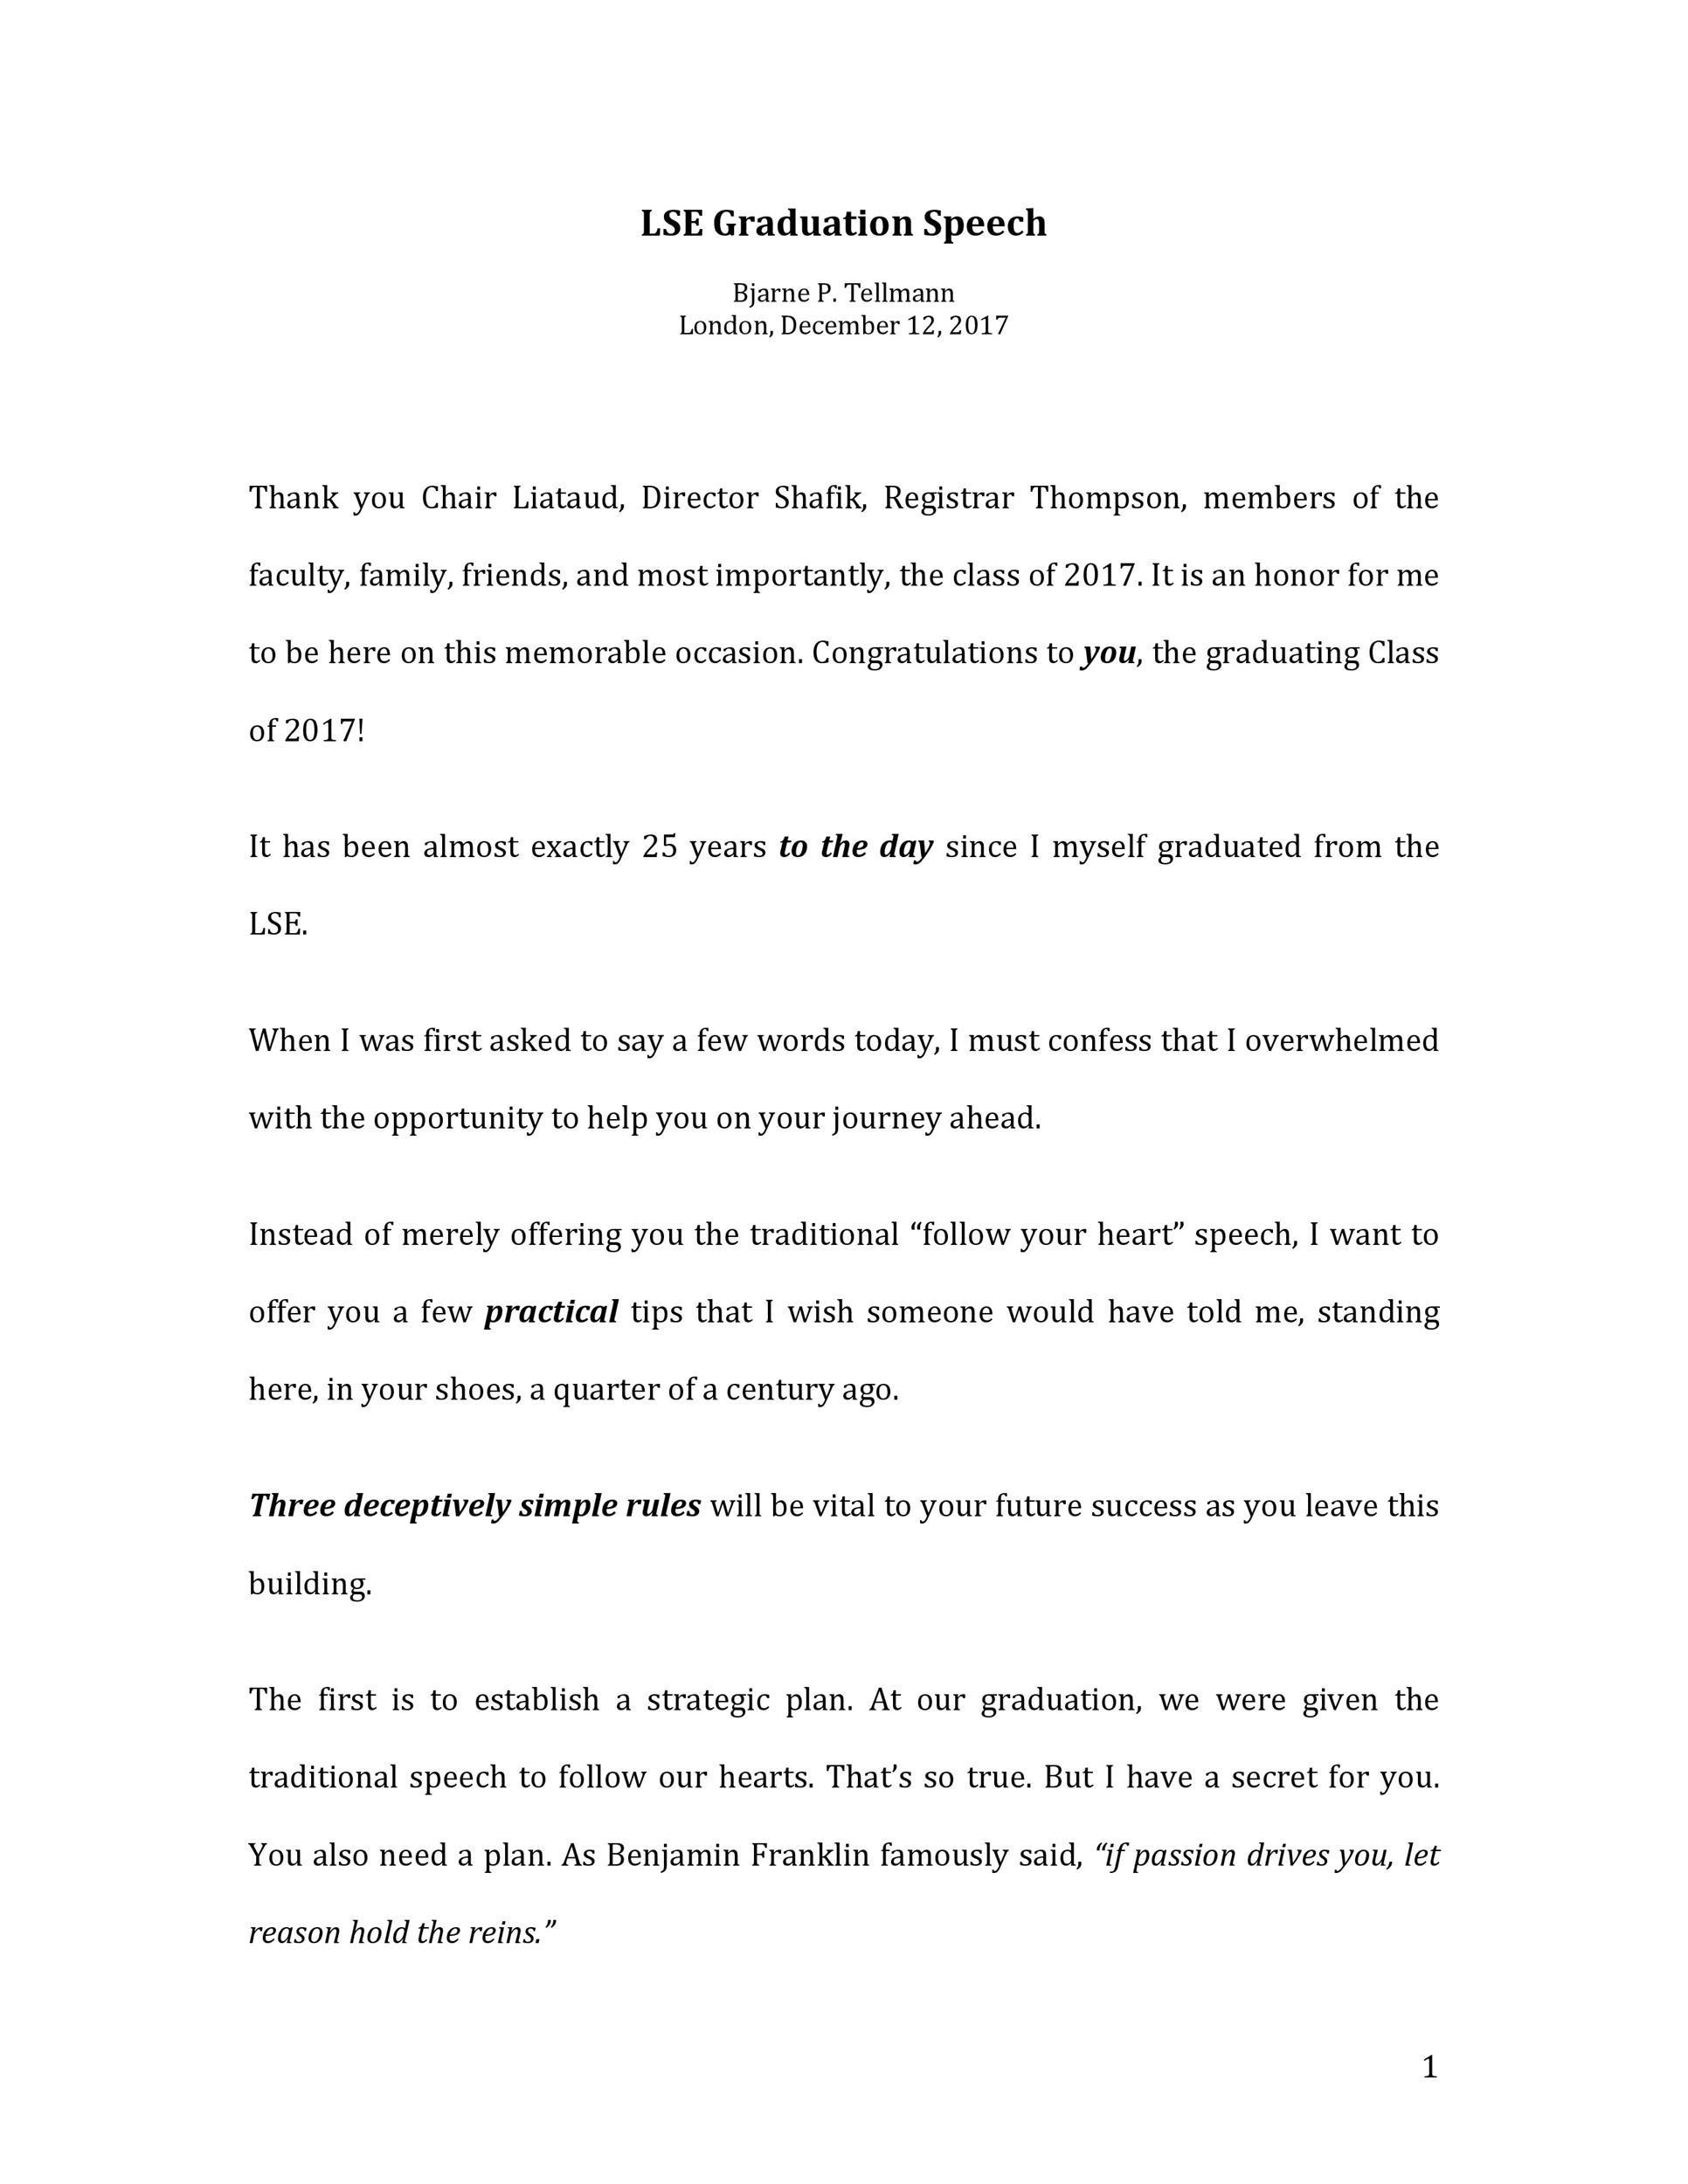 Free graduation speech example 36